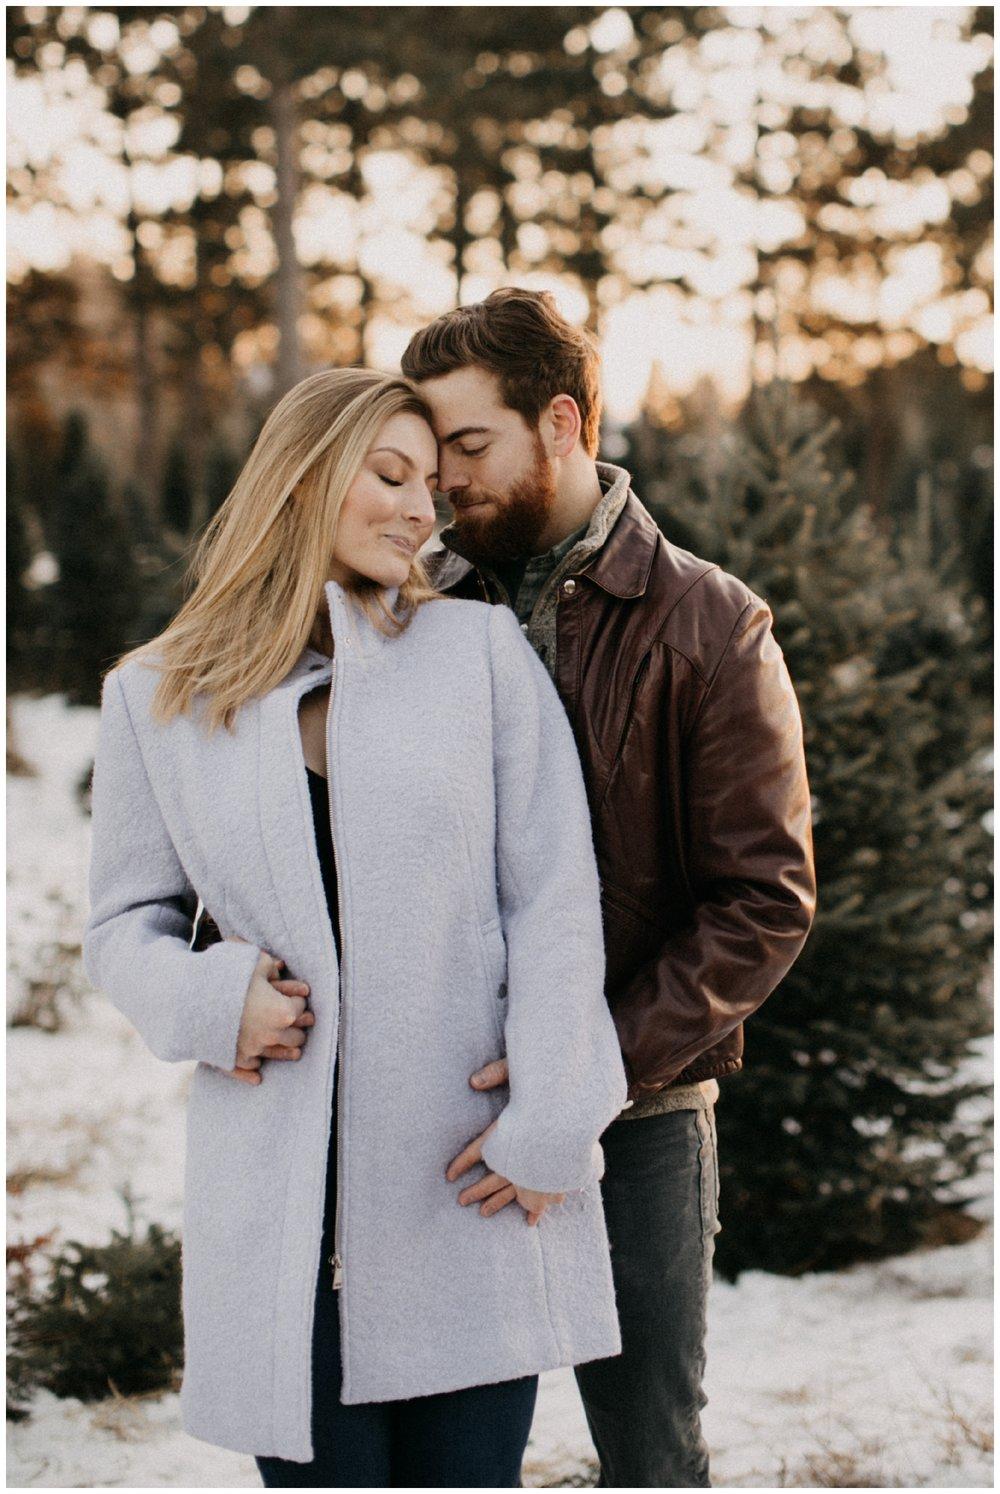 Romantic winter engagement session at Hansen Tree Farm